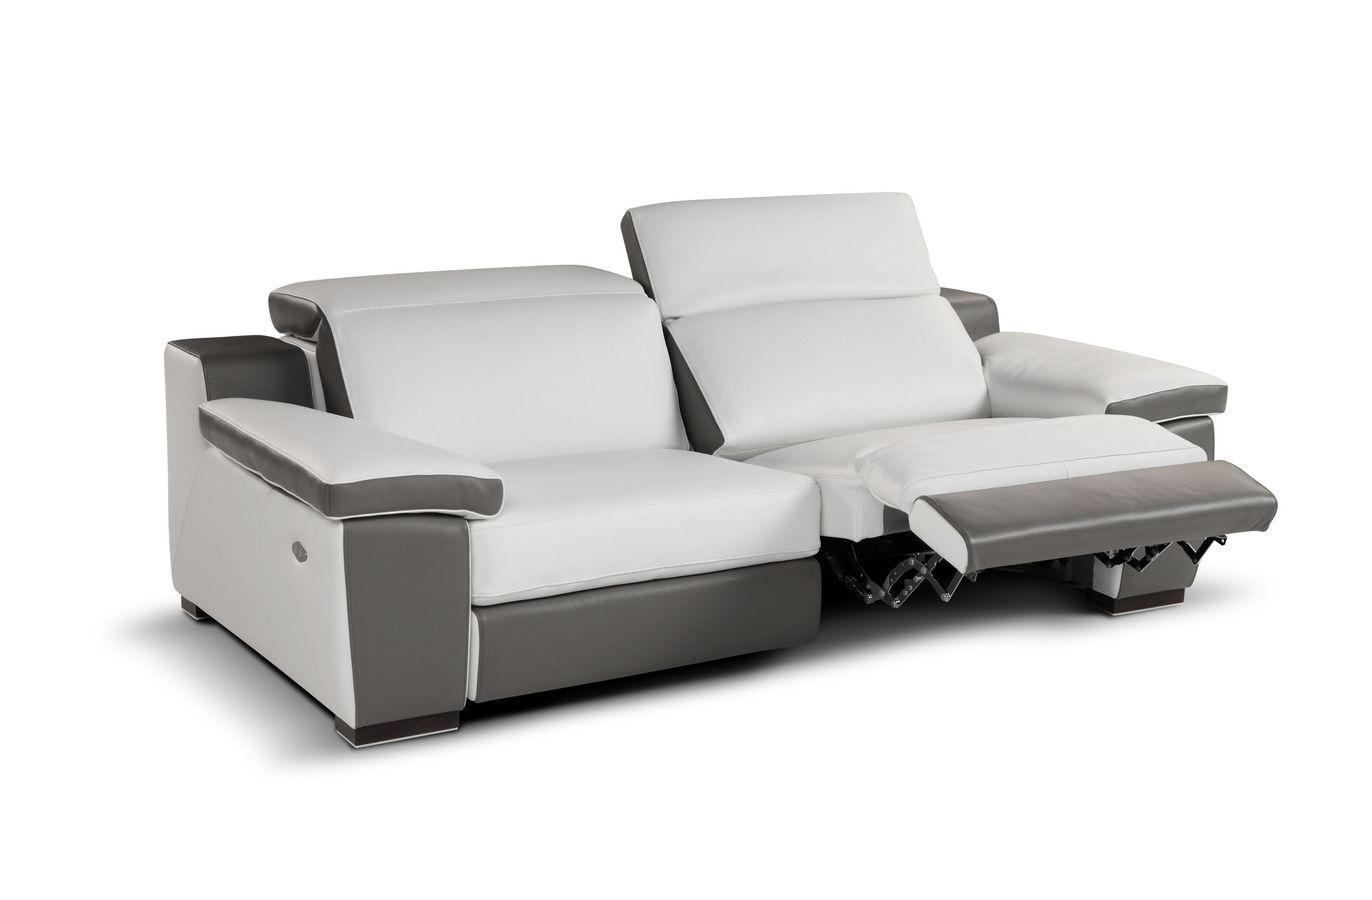 Ergonomic Sofa Furniture ~ Hmmi Within Ergonomic Sofas And Chairs (View 4 of 20)